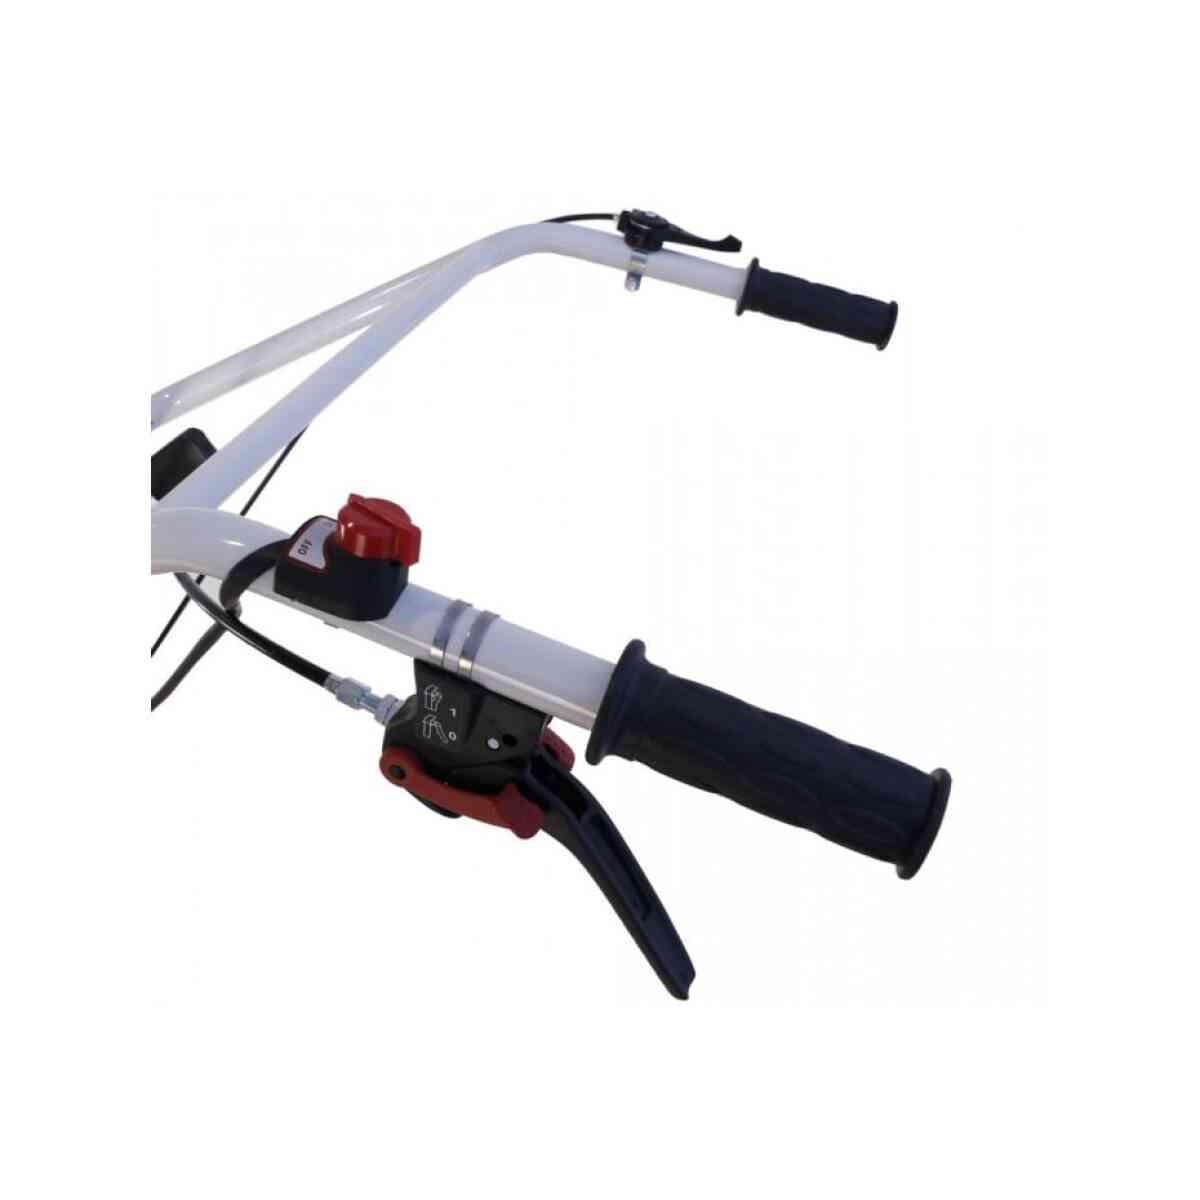 motocultor loncin lc750 7cp o mac.ro 12 79